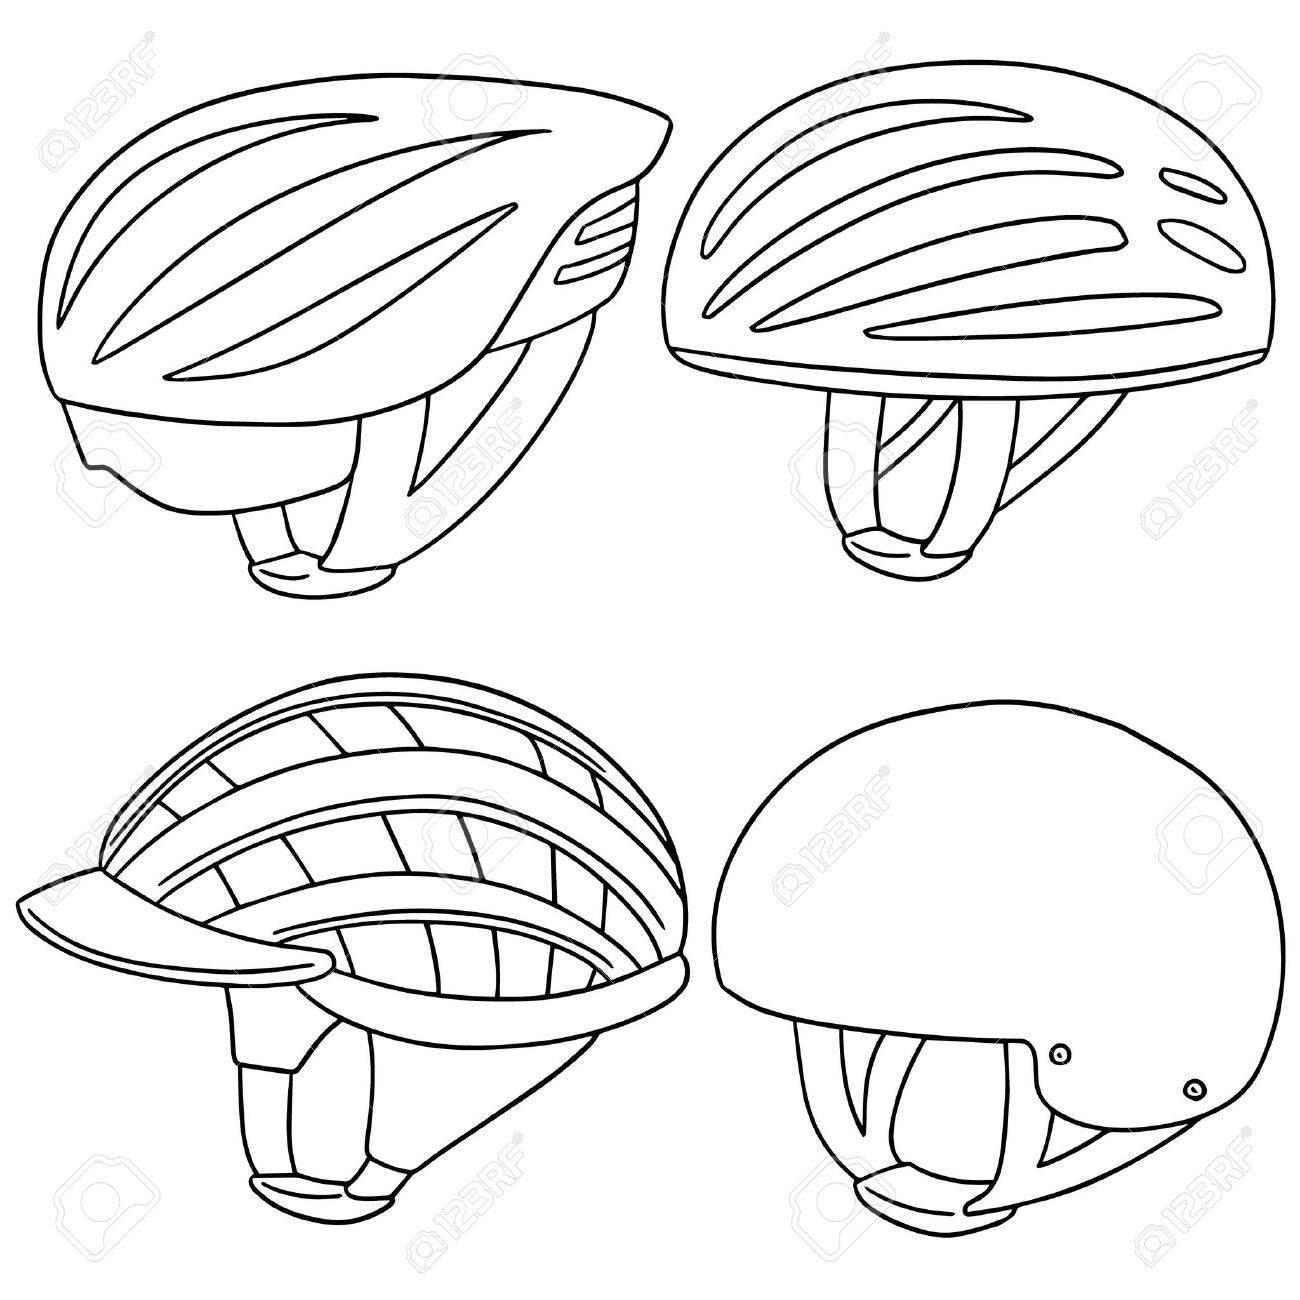 1300x1300 Vector Set Of Bicycle Helmet Royalty Free Cliparts, Vectors,